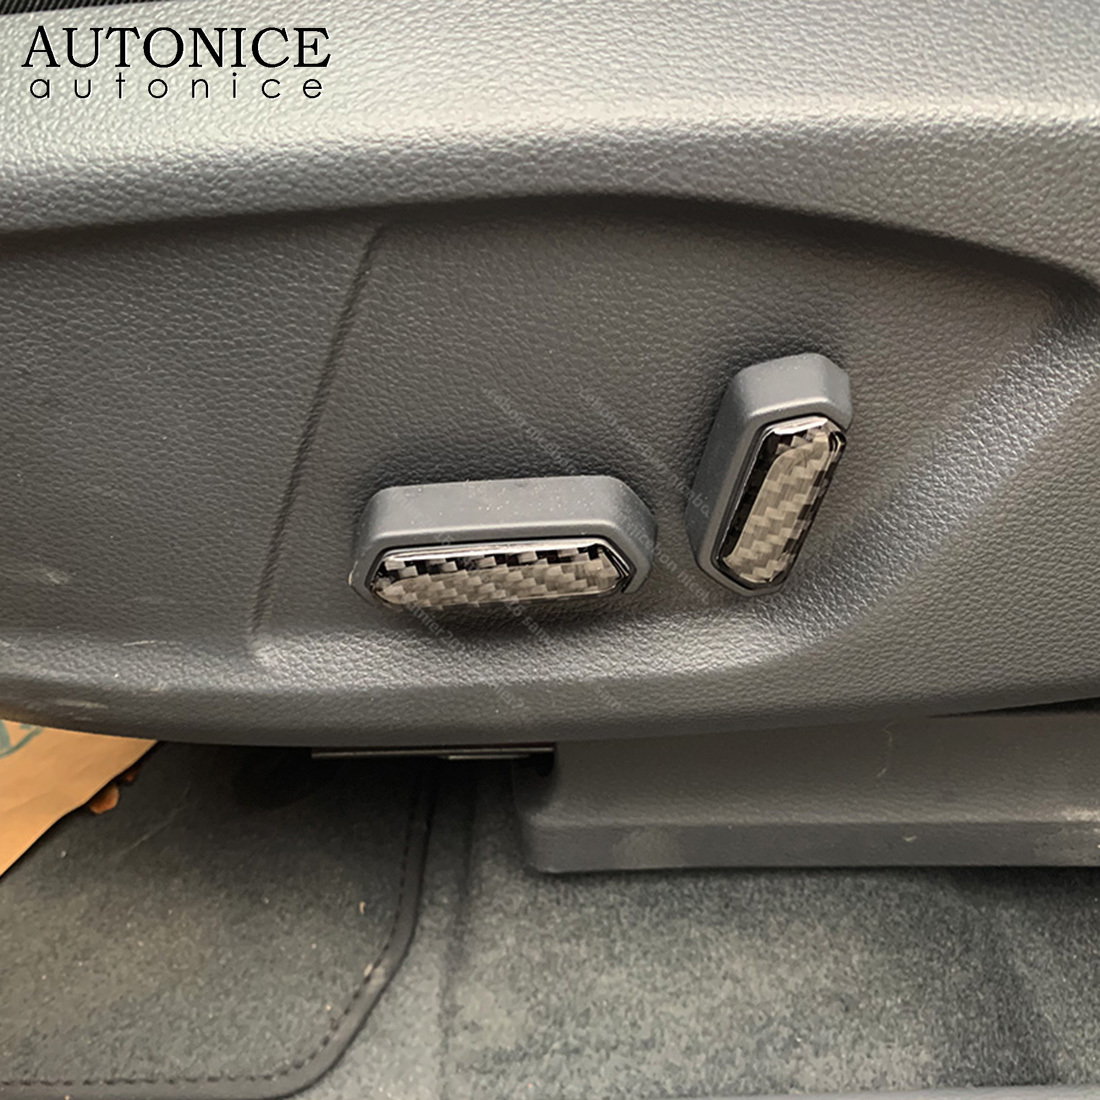 4x4 Air Intake Snorkel Kit For Mazda BT-50 BT50 Pickup 2.2L 3.2L Diesel 2012-ON